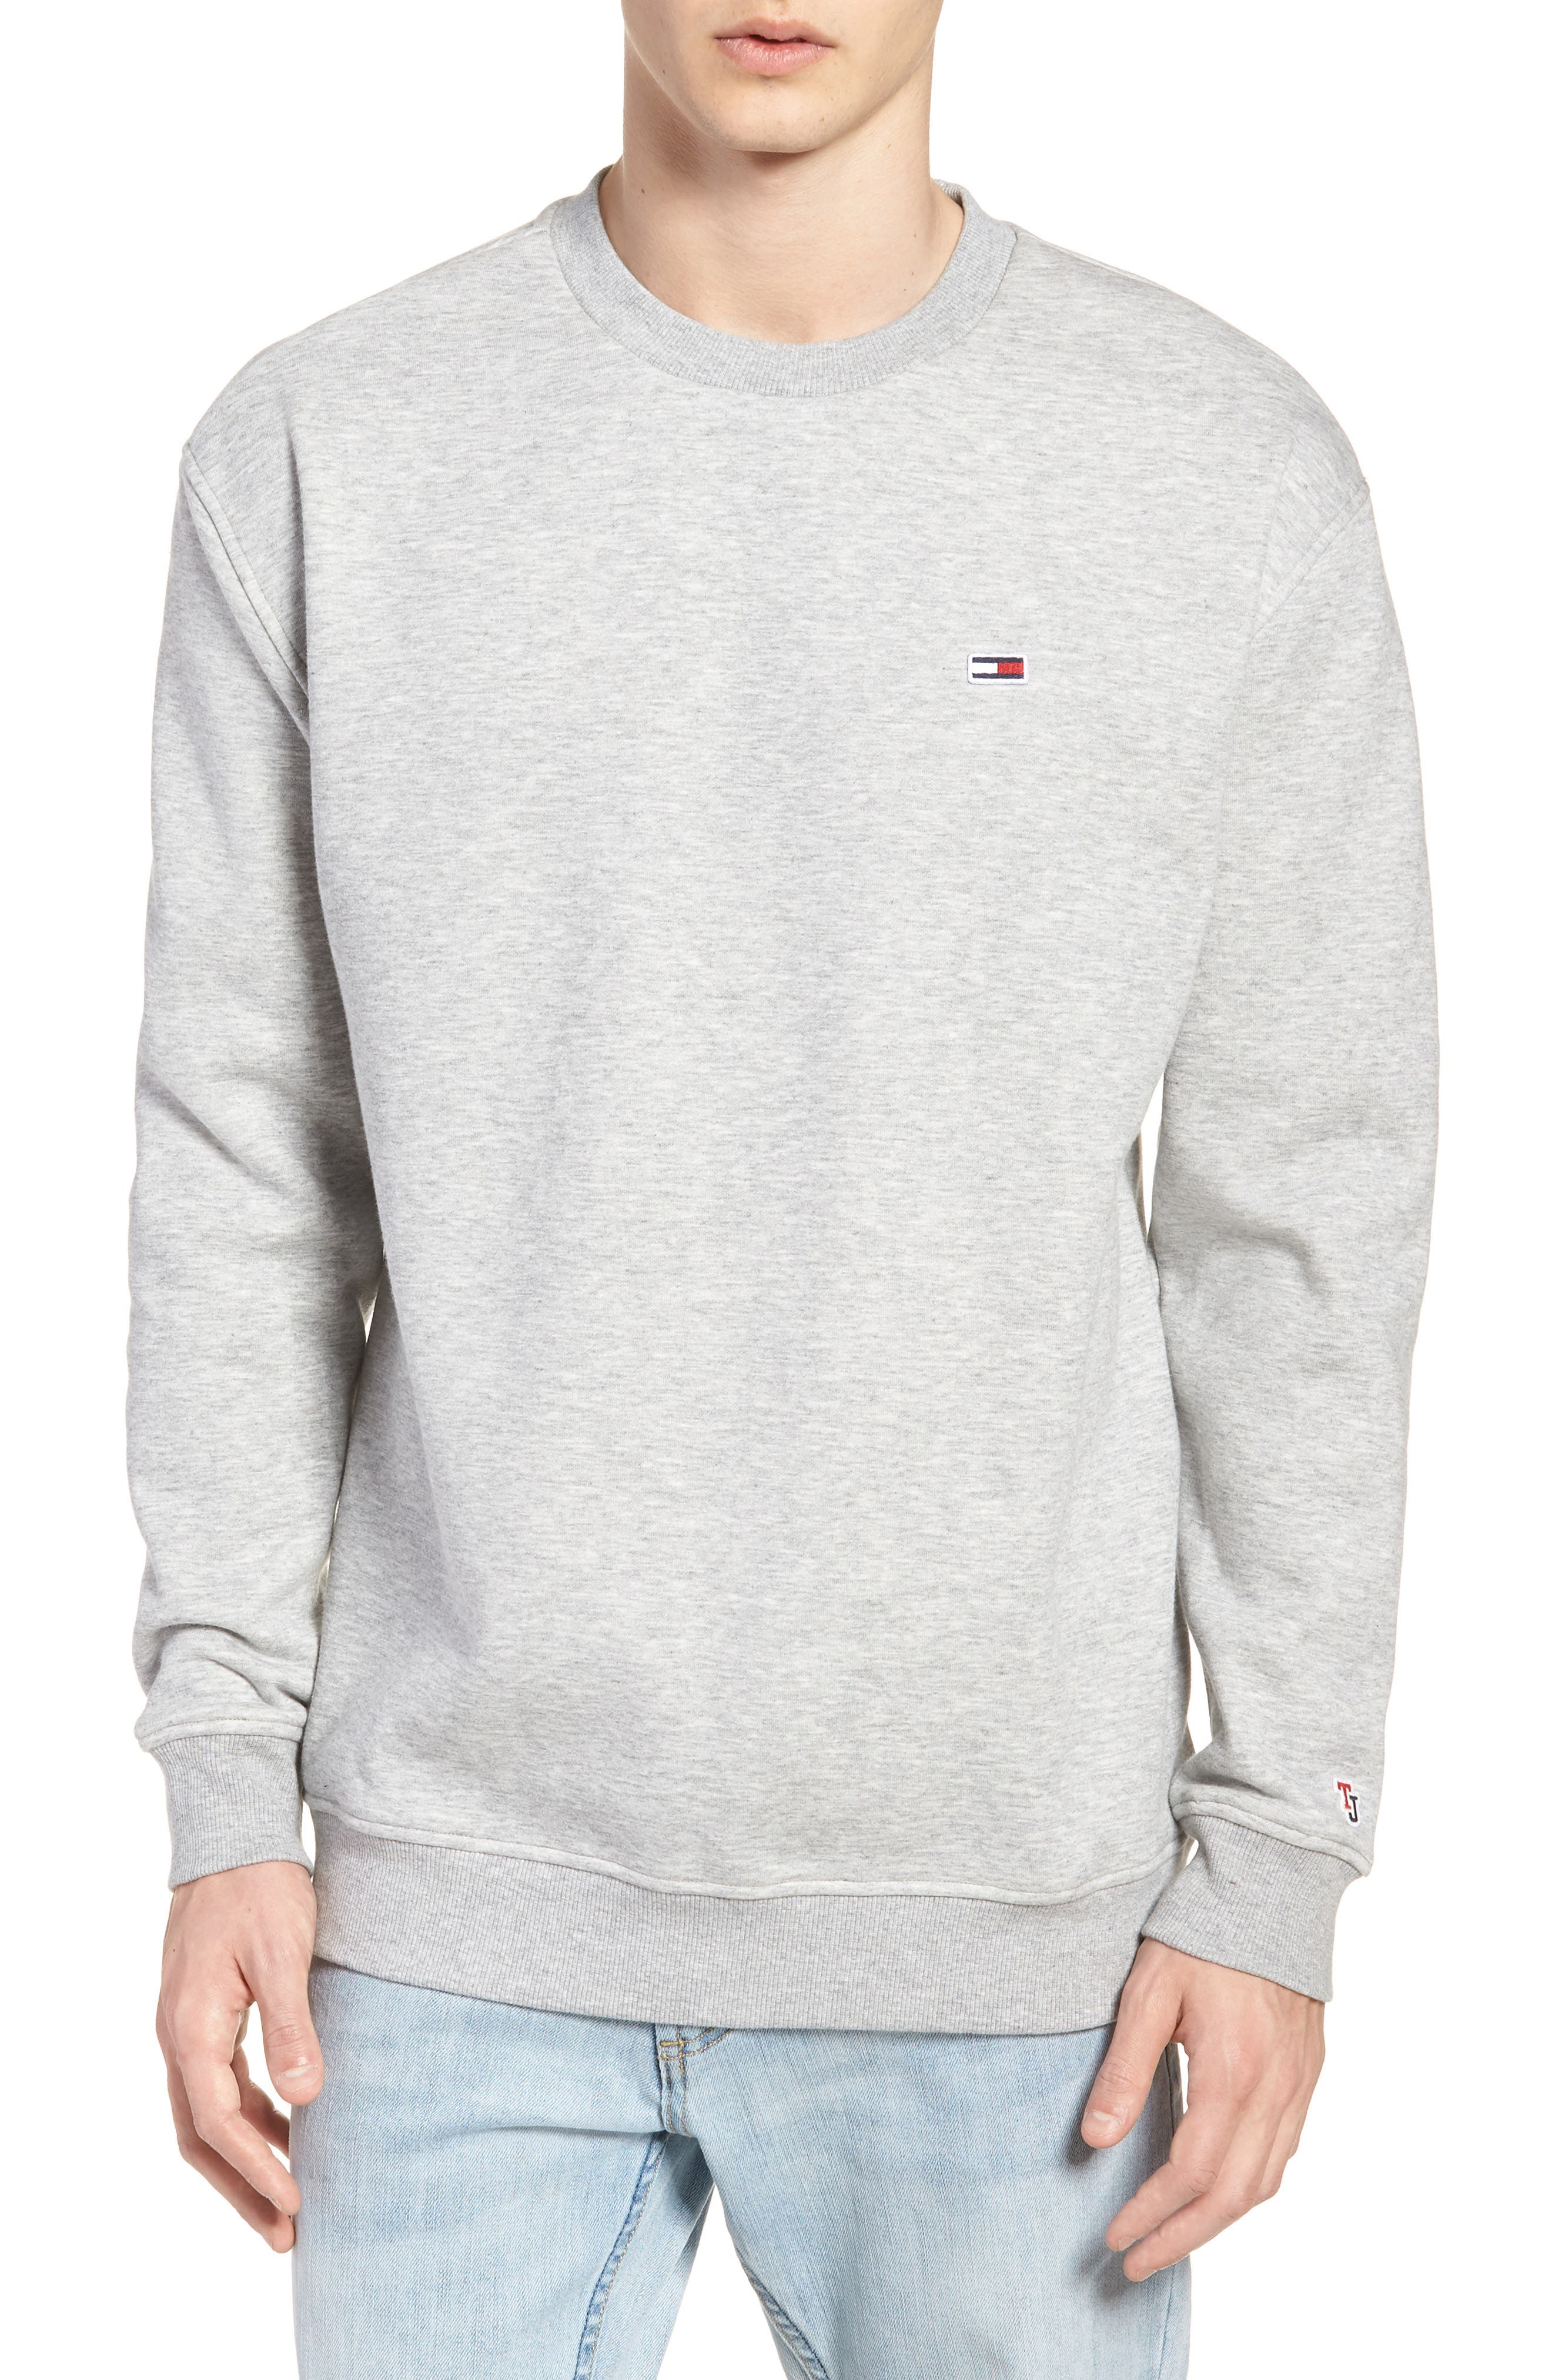 Tommy Classics Crewneck Sweatshirt,                         Main,                         color, LIGHT GREY HEATHER